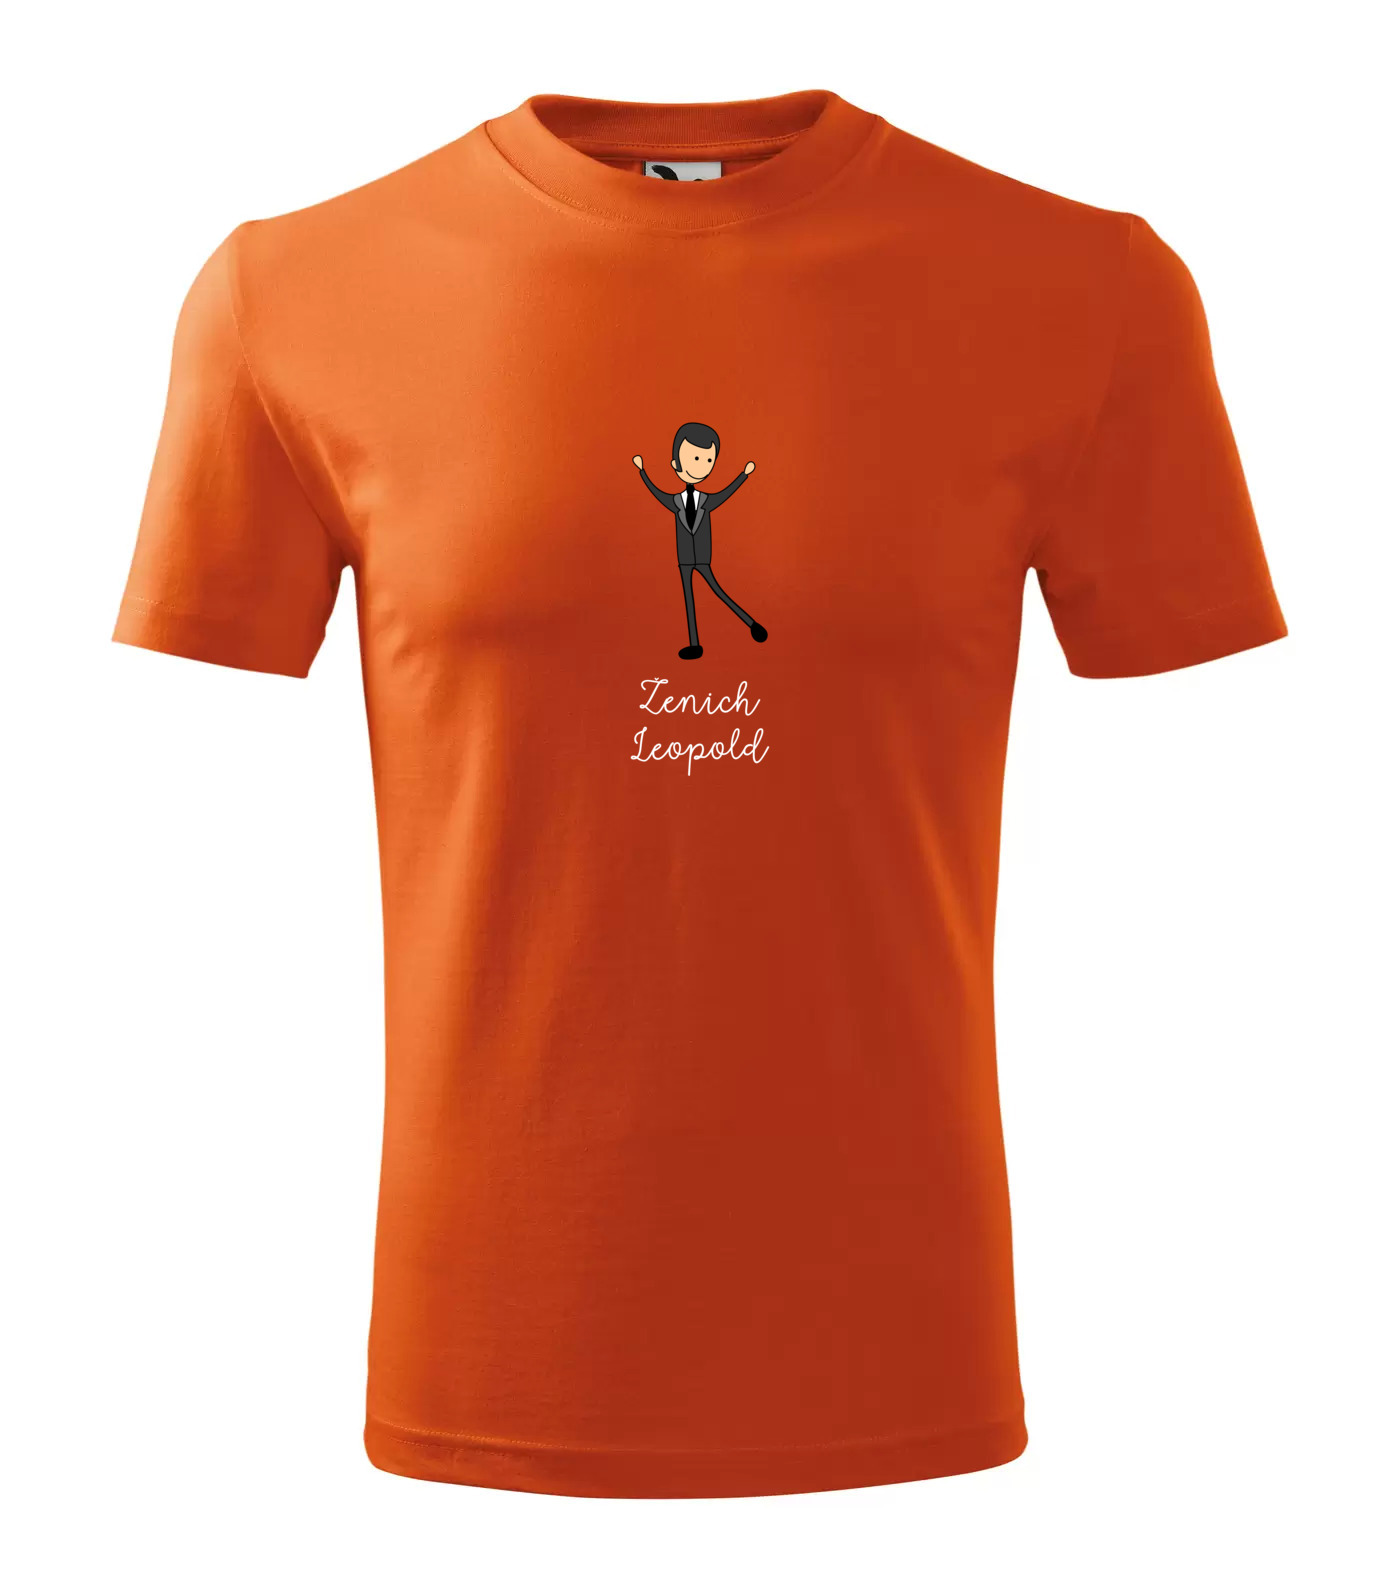 Tričko Ženich Leopold